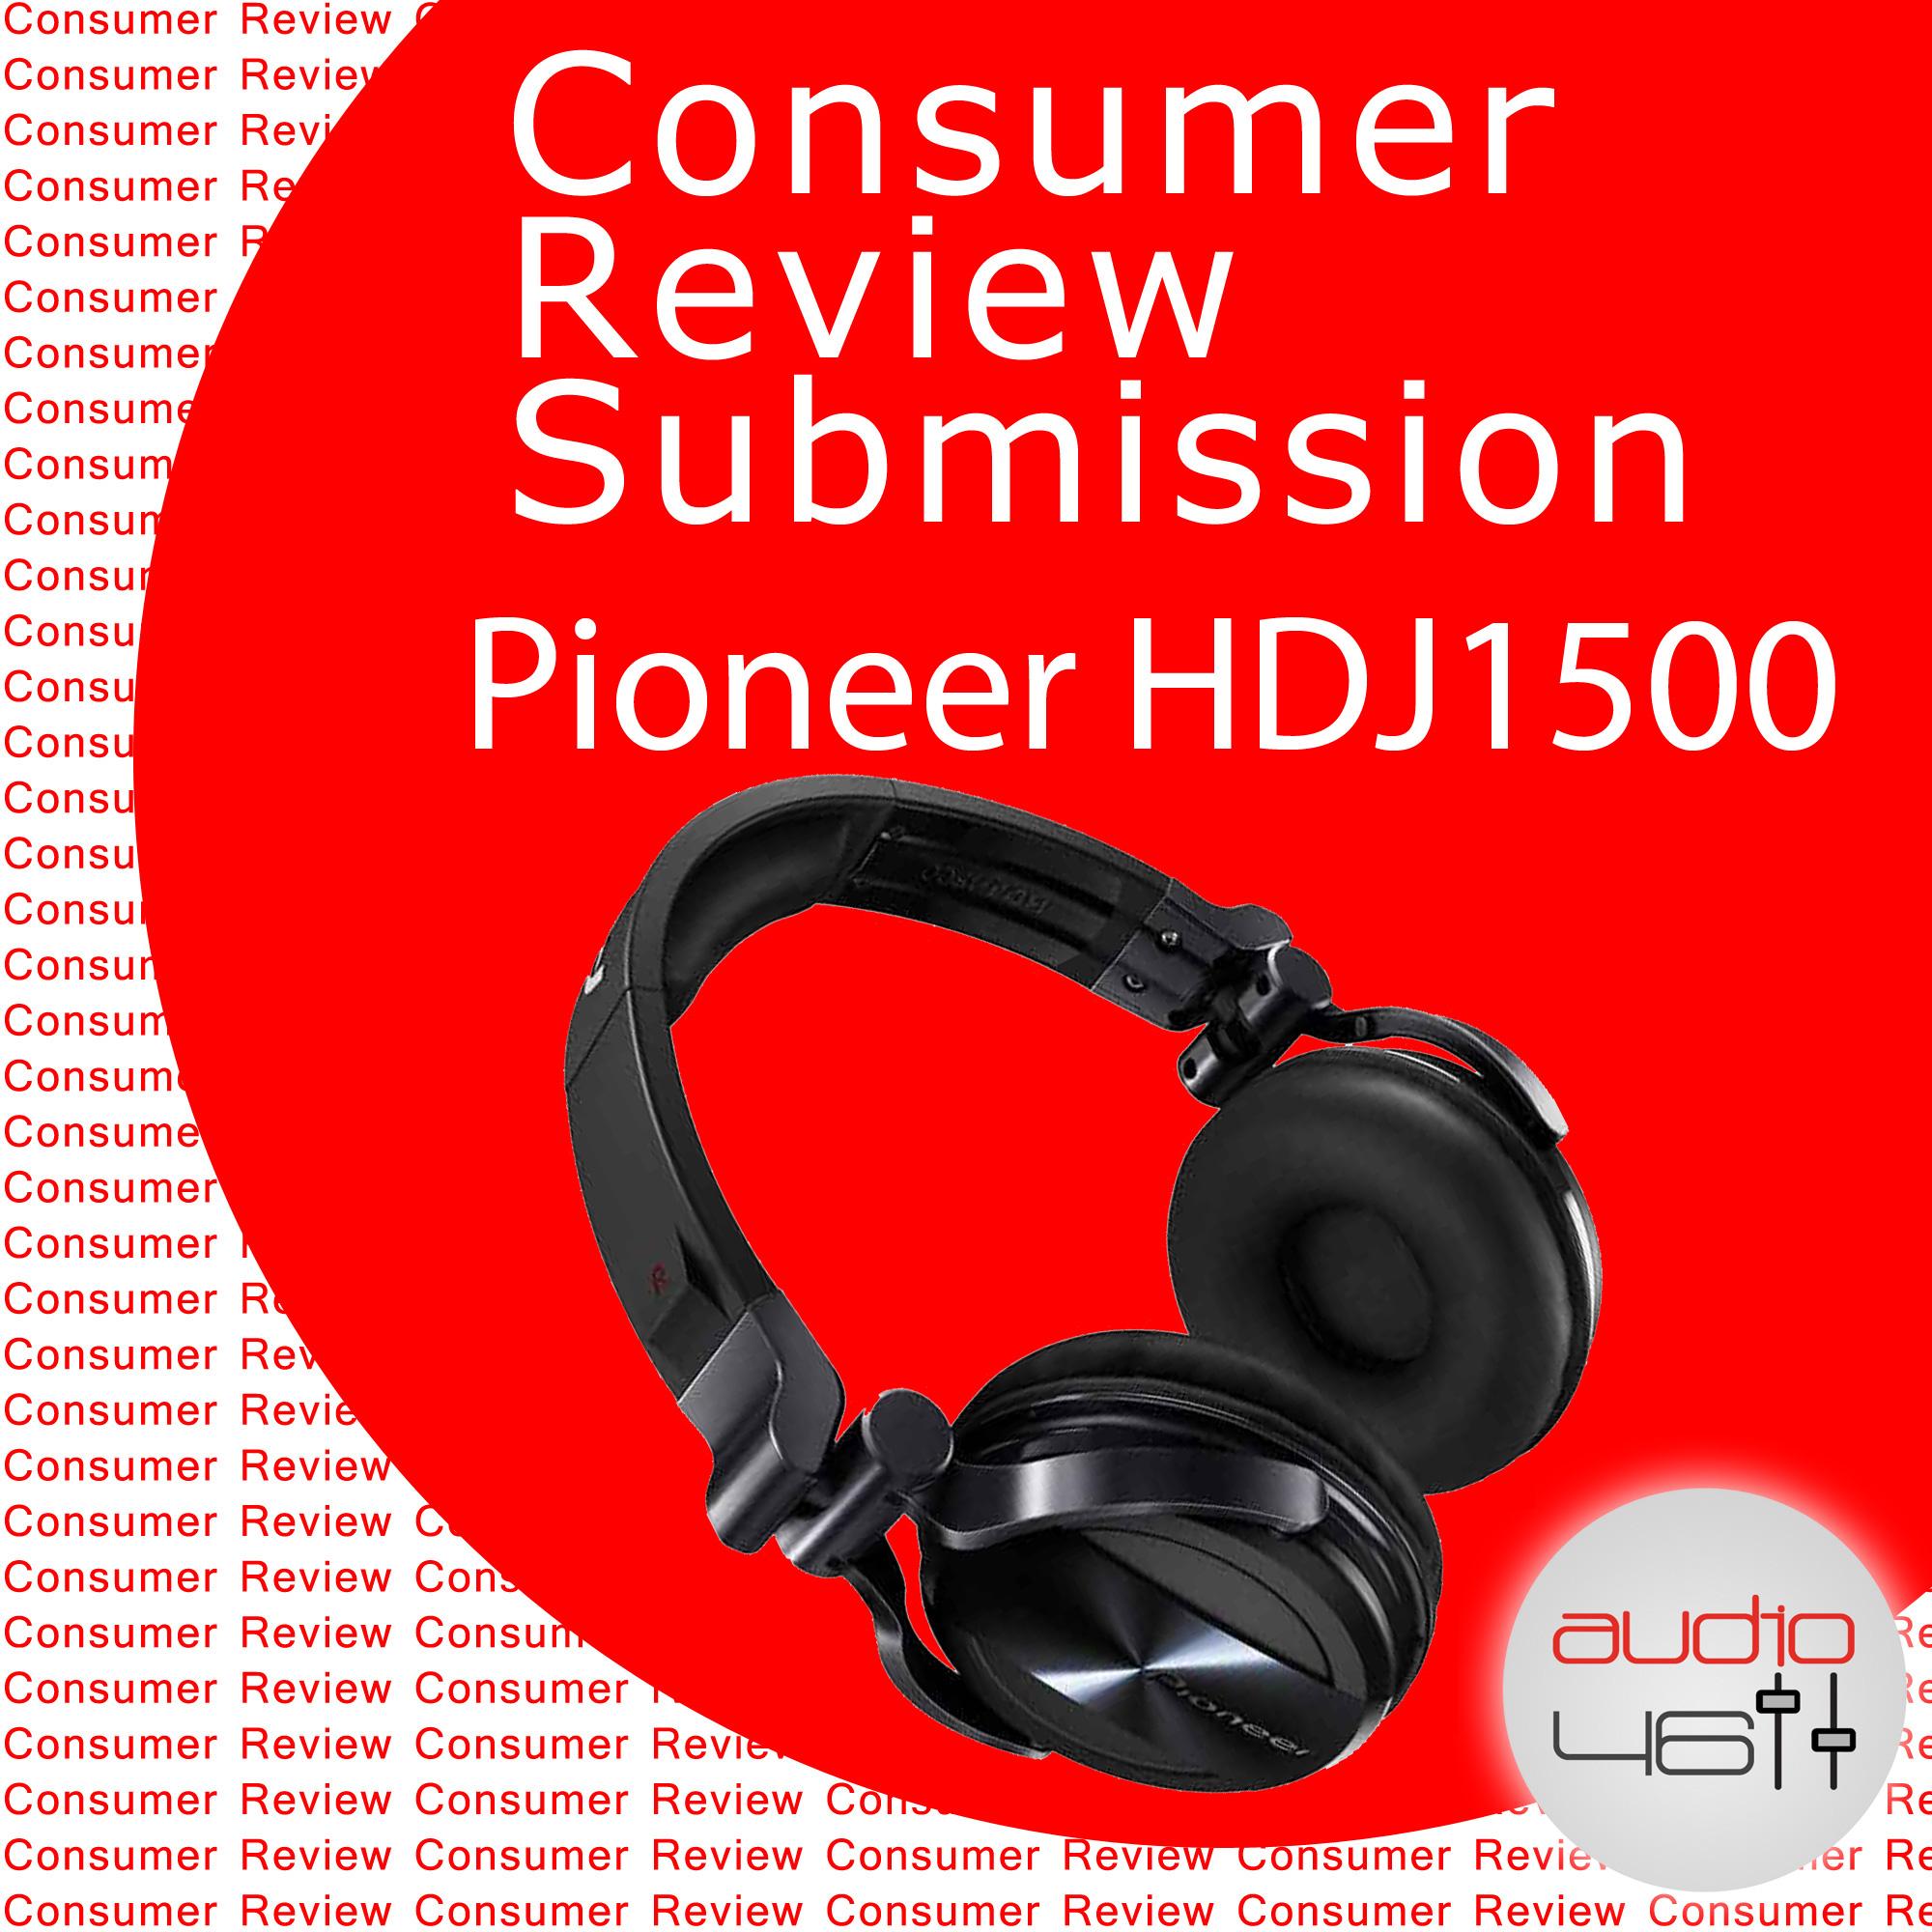 Consumer Review – Pioneer HDJ 1500